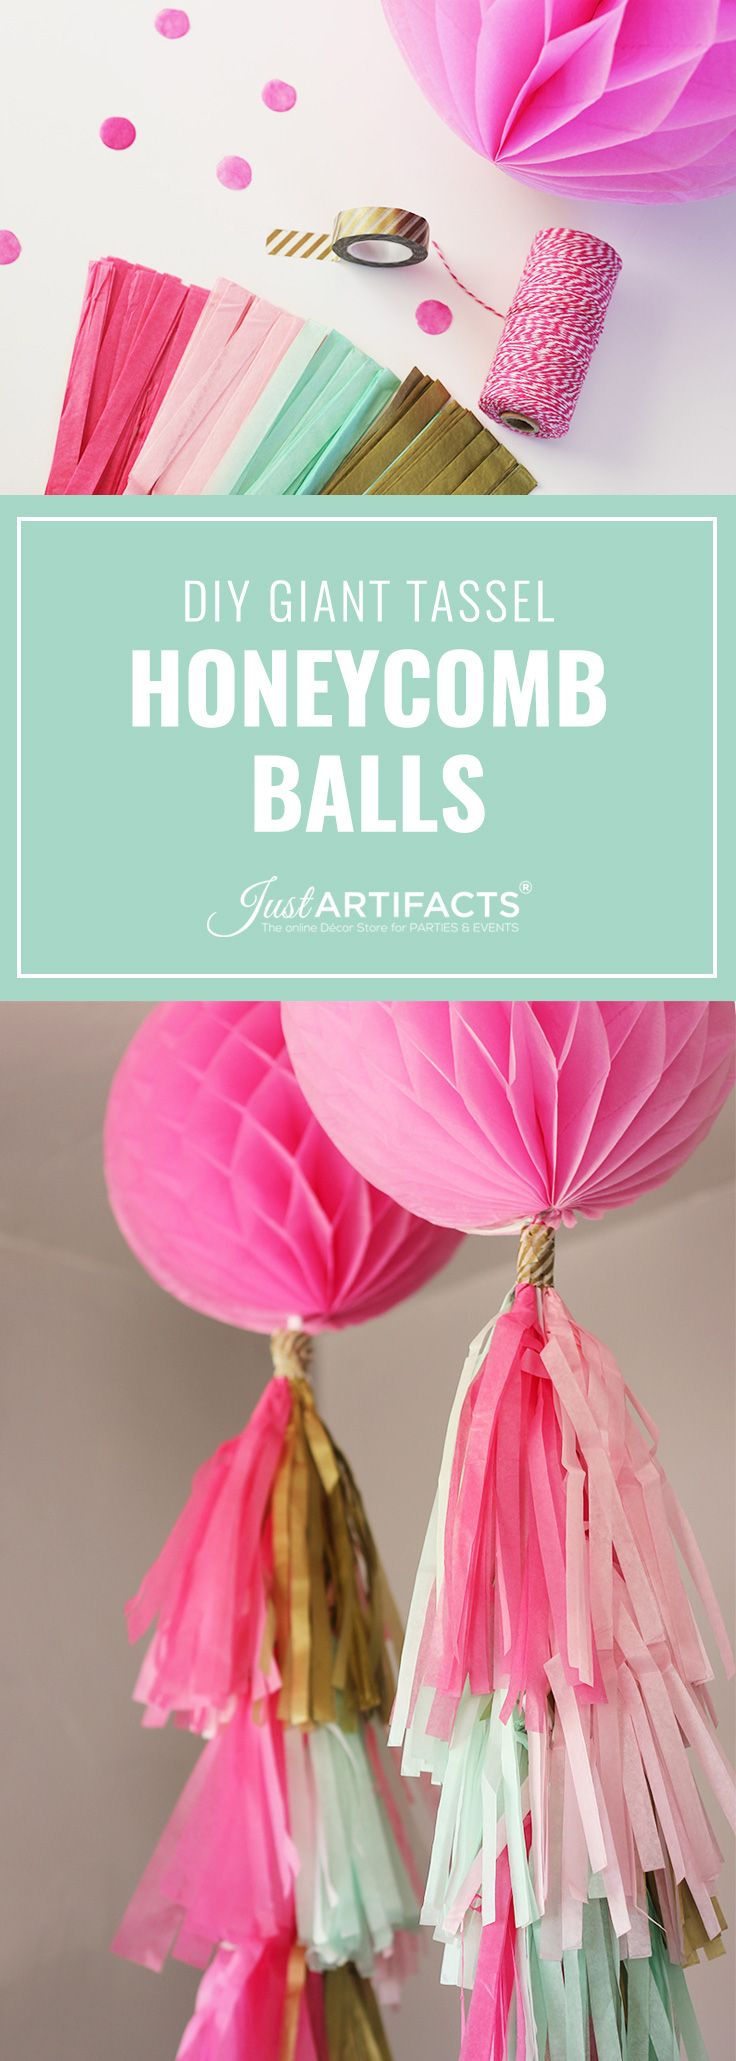 Honeycomb Ball Decorations Diy Giant Tassel Honeycomb Balls  These Simple Honeycomb Ball